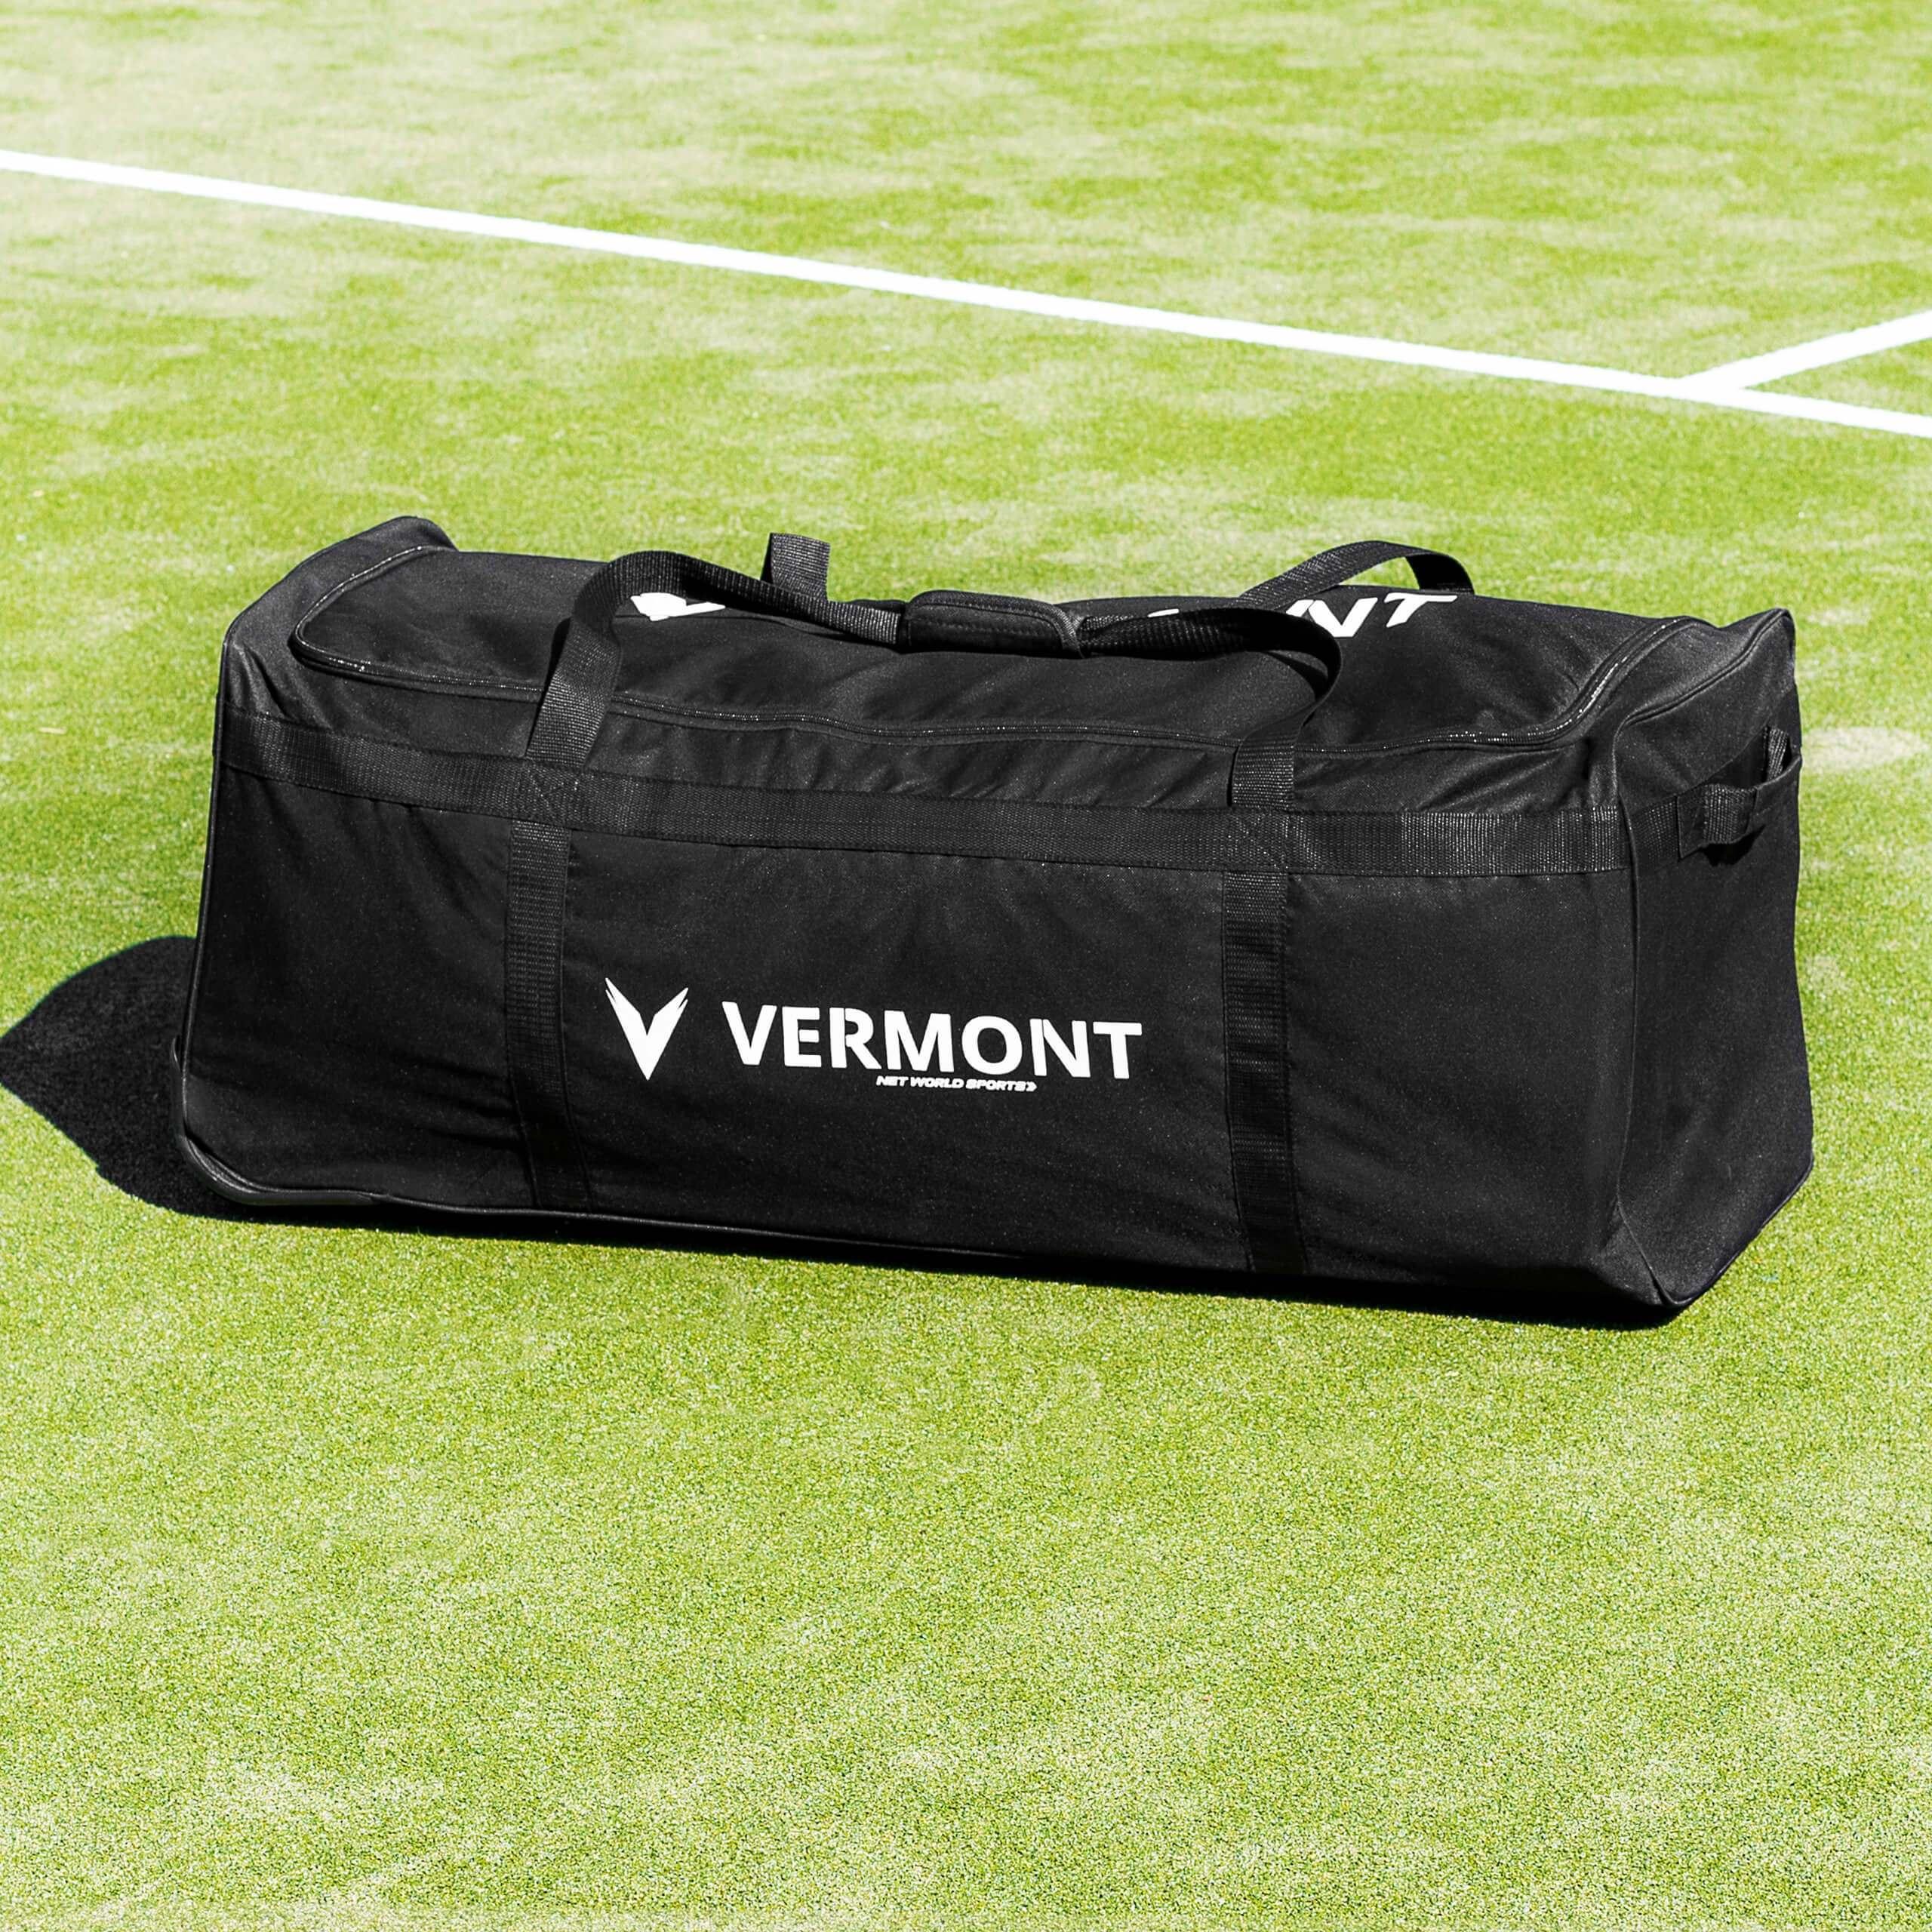 Vermont Tennis Racket Bags [4x Sizes]